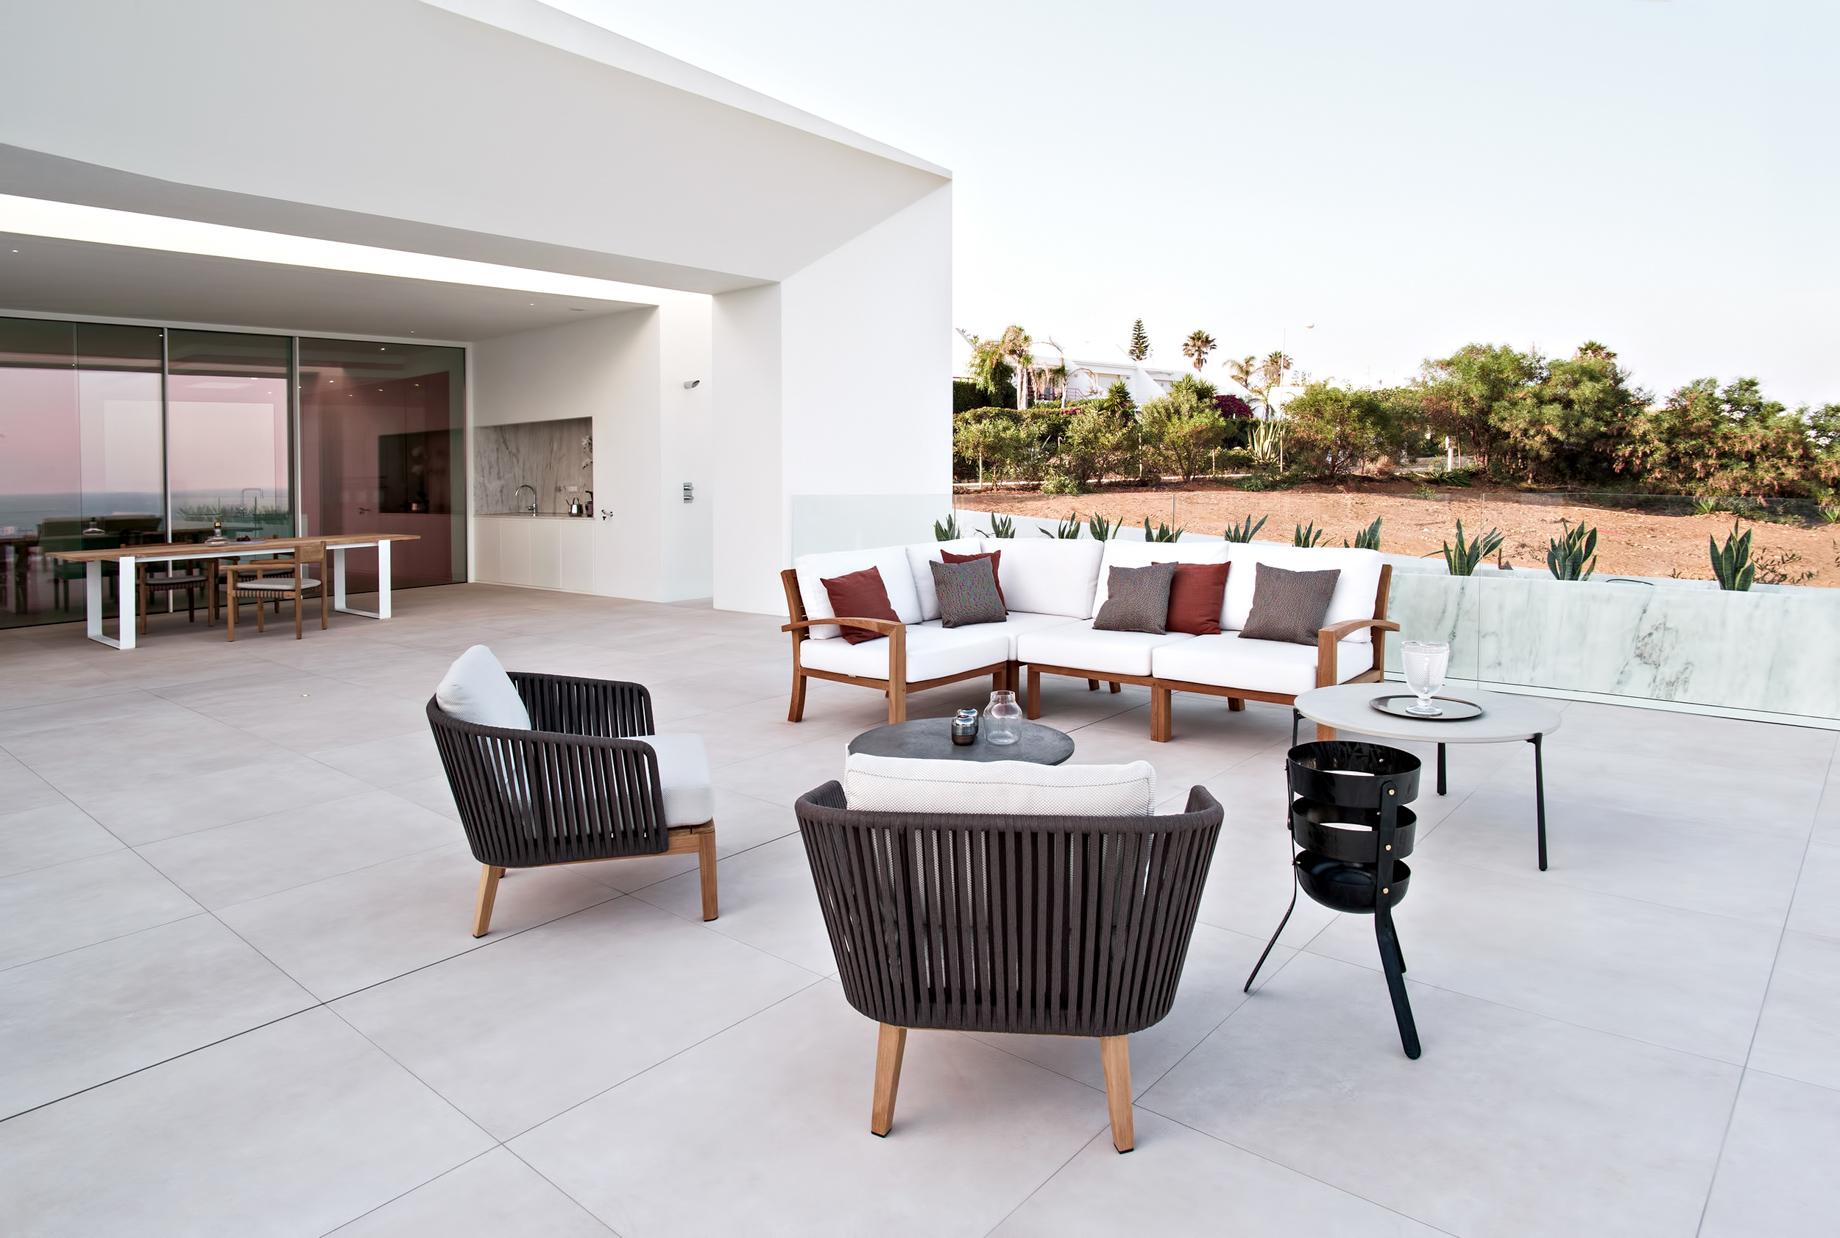 Casa Carrara Luxury Residence – Praia da Luz, Algarve, Portugal